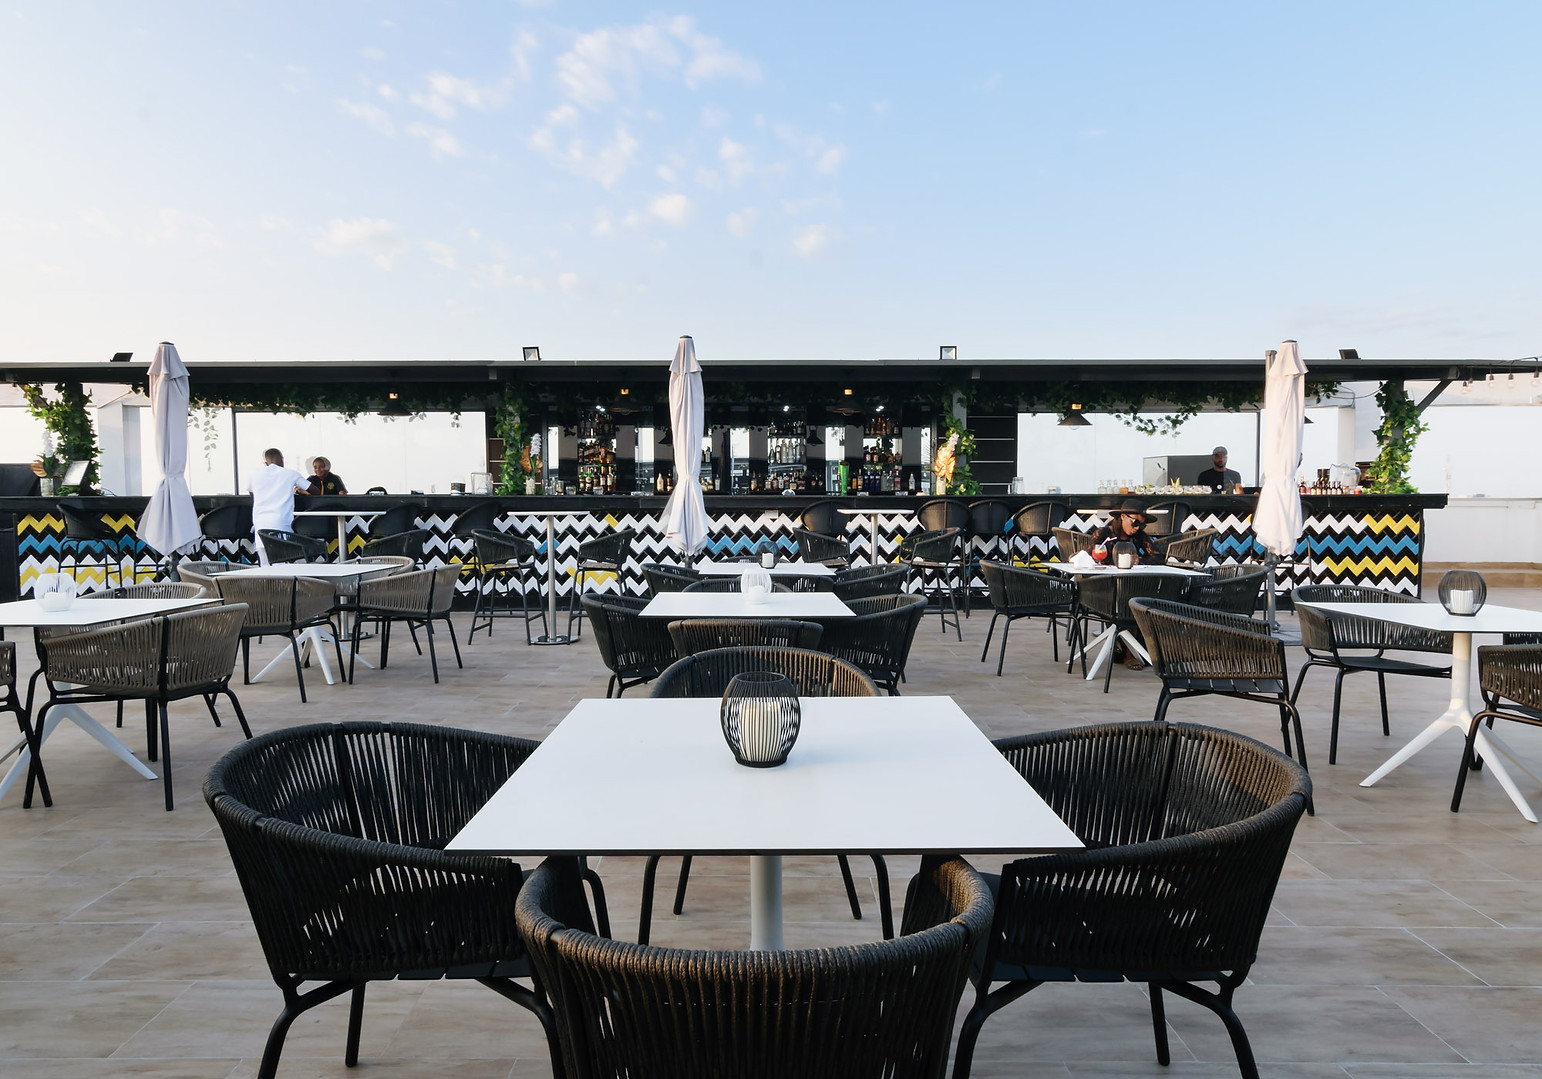 DCC_Atmosphere Rooftop Restaurant_21.jpg